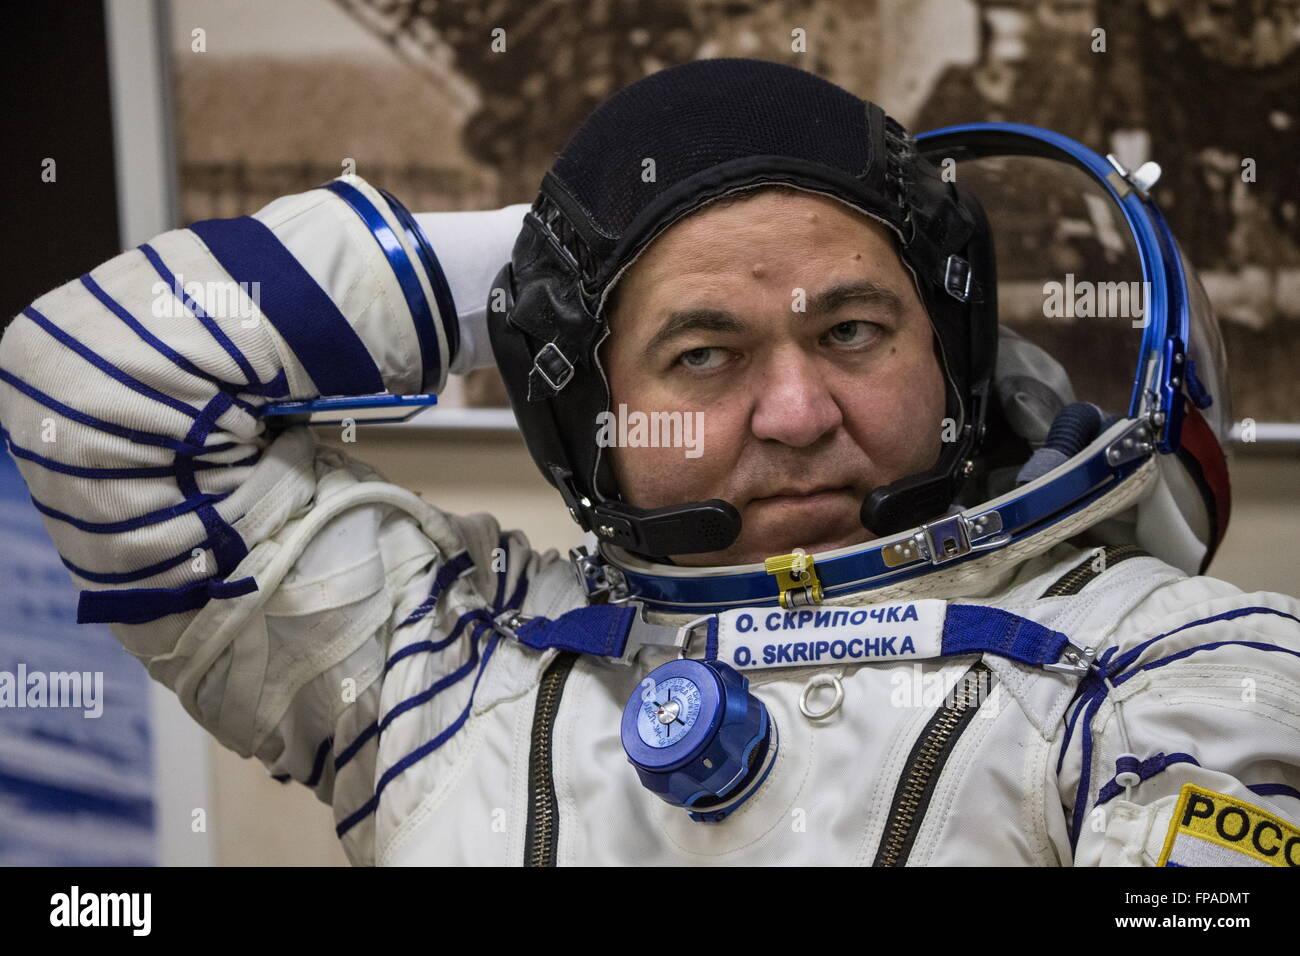 Baikonur, Kazakhstan. 18th Mar, 2016. Crew member of Expedition 47/48, Roscosmos cosmonaut Oleg Skripochka looks - Stock Image